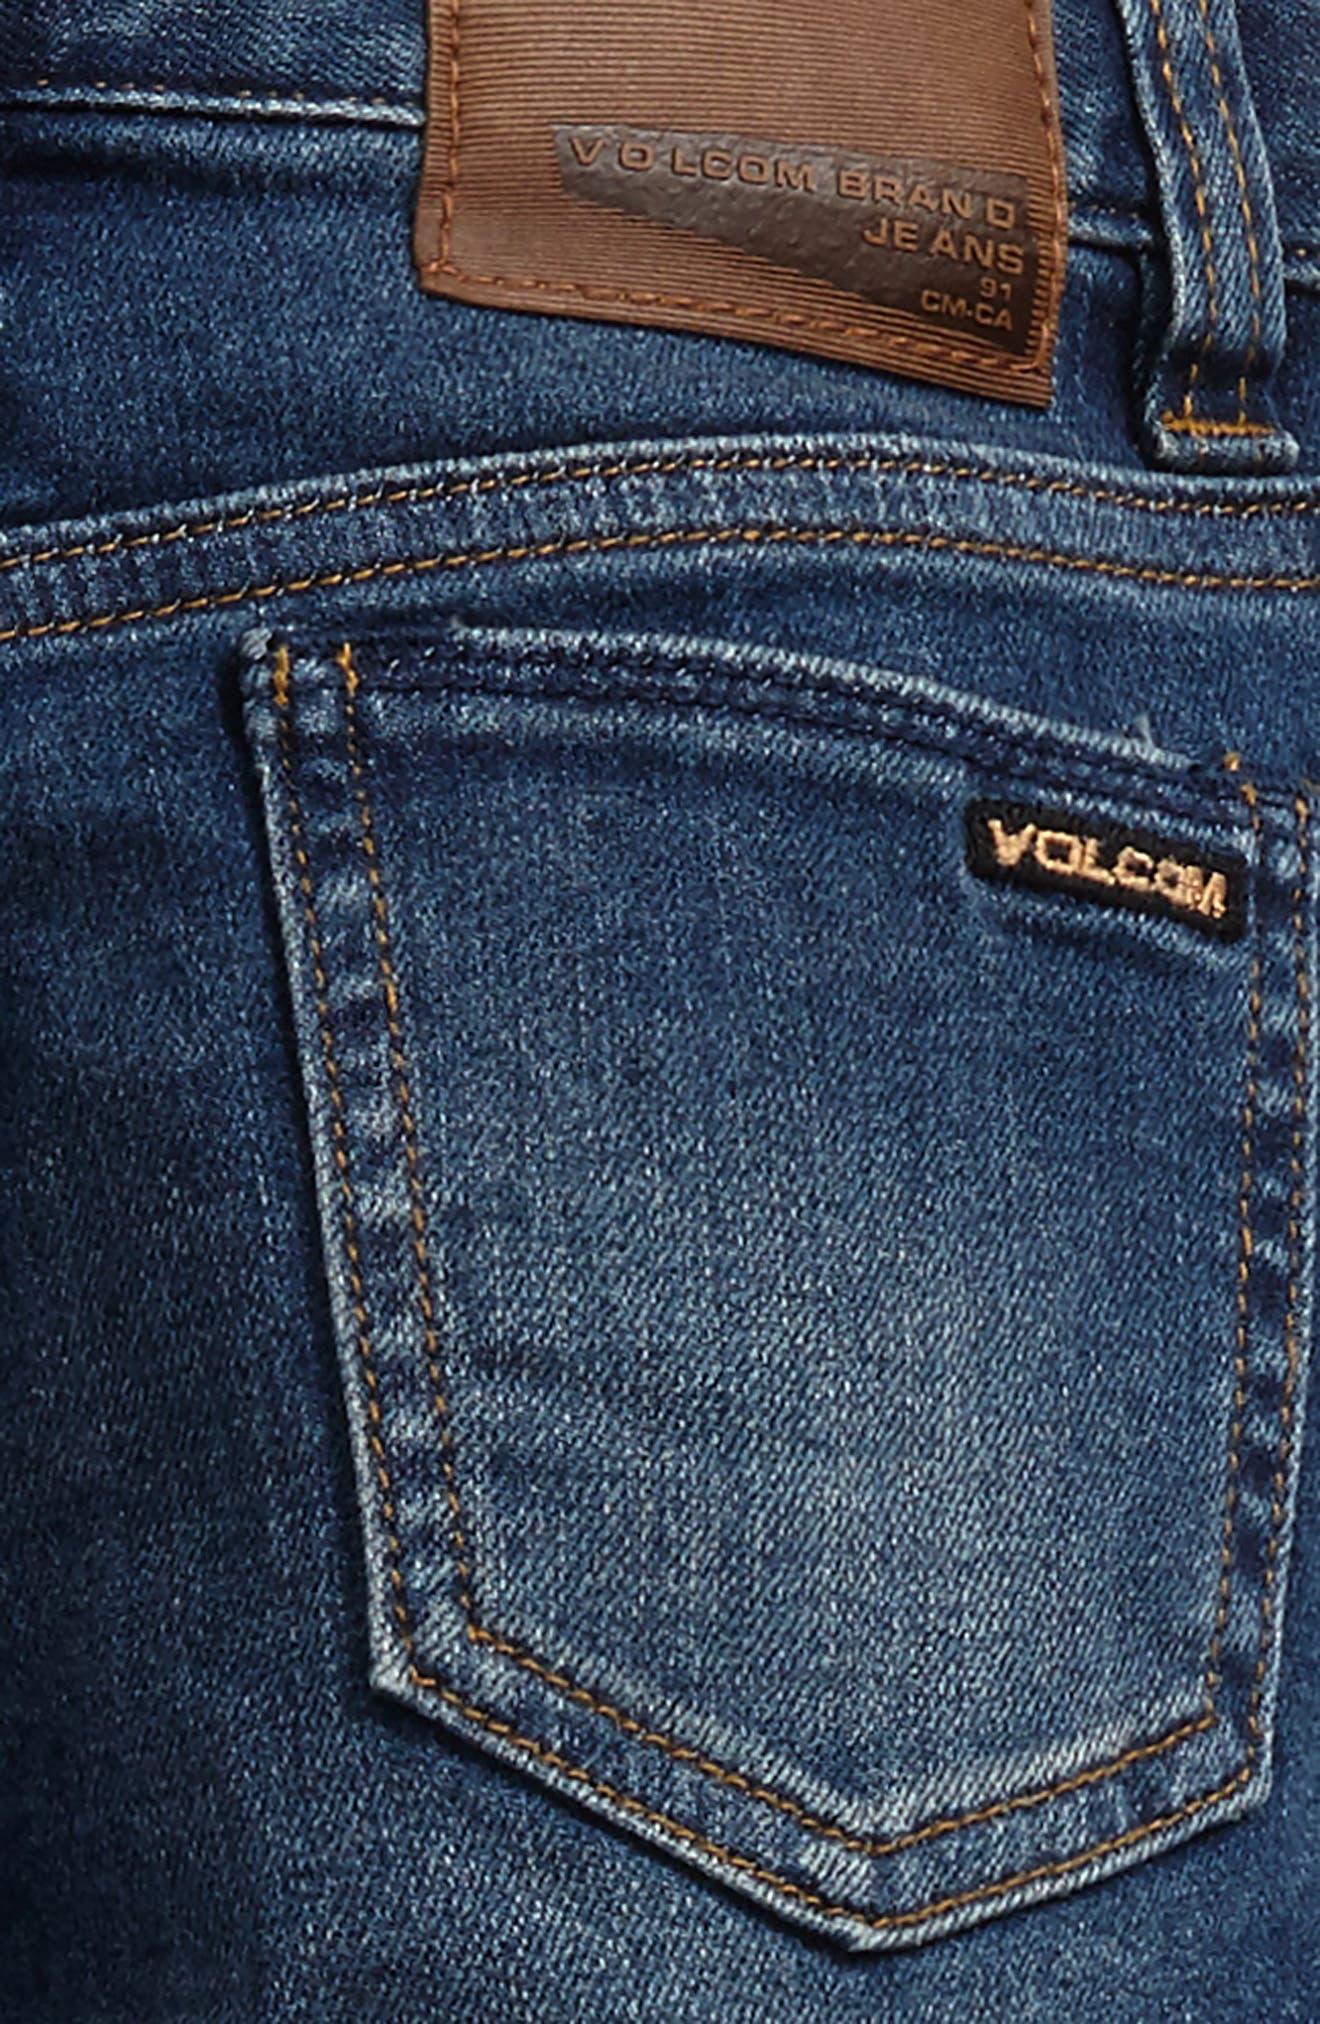 Alternate Image 3  - Volcom 'Vorta' Slim Fit Jeans (Toddler Boys & Little Boys)